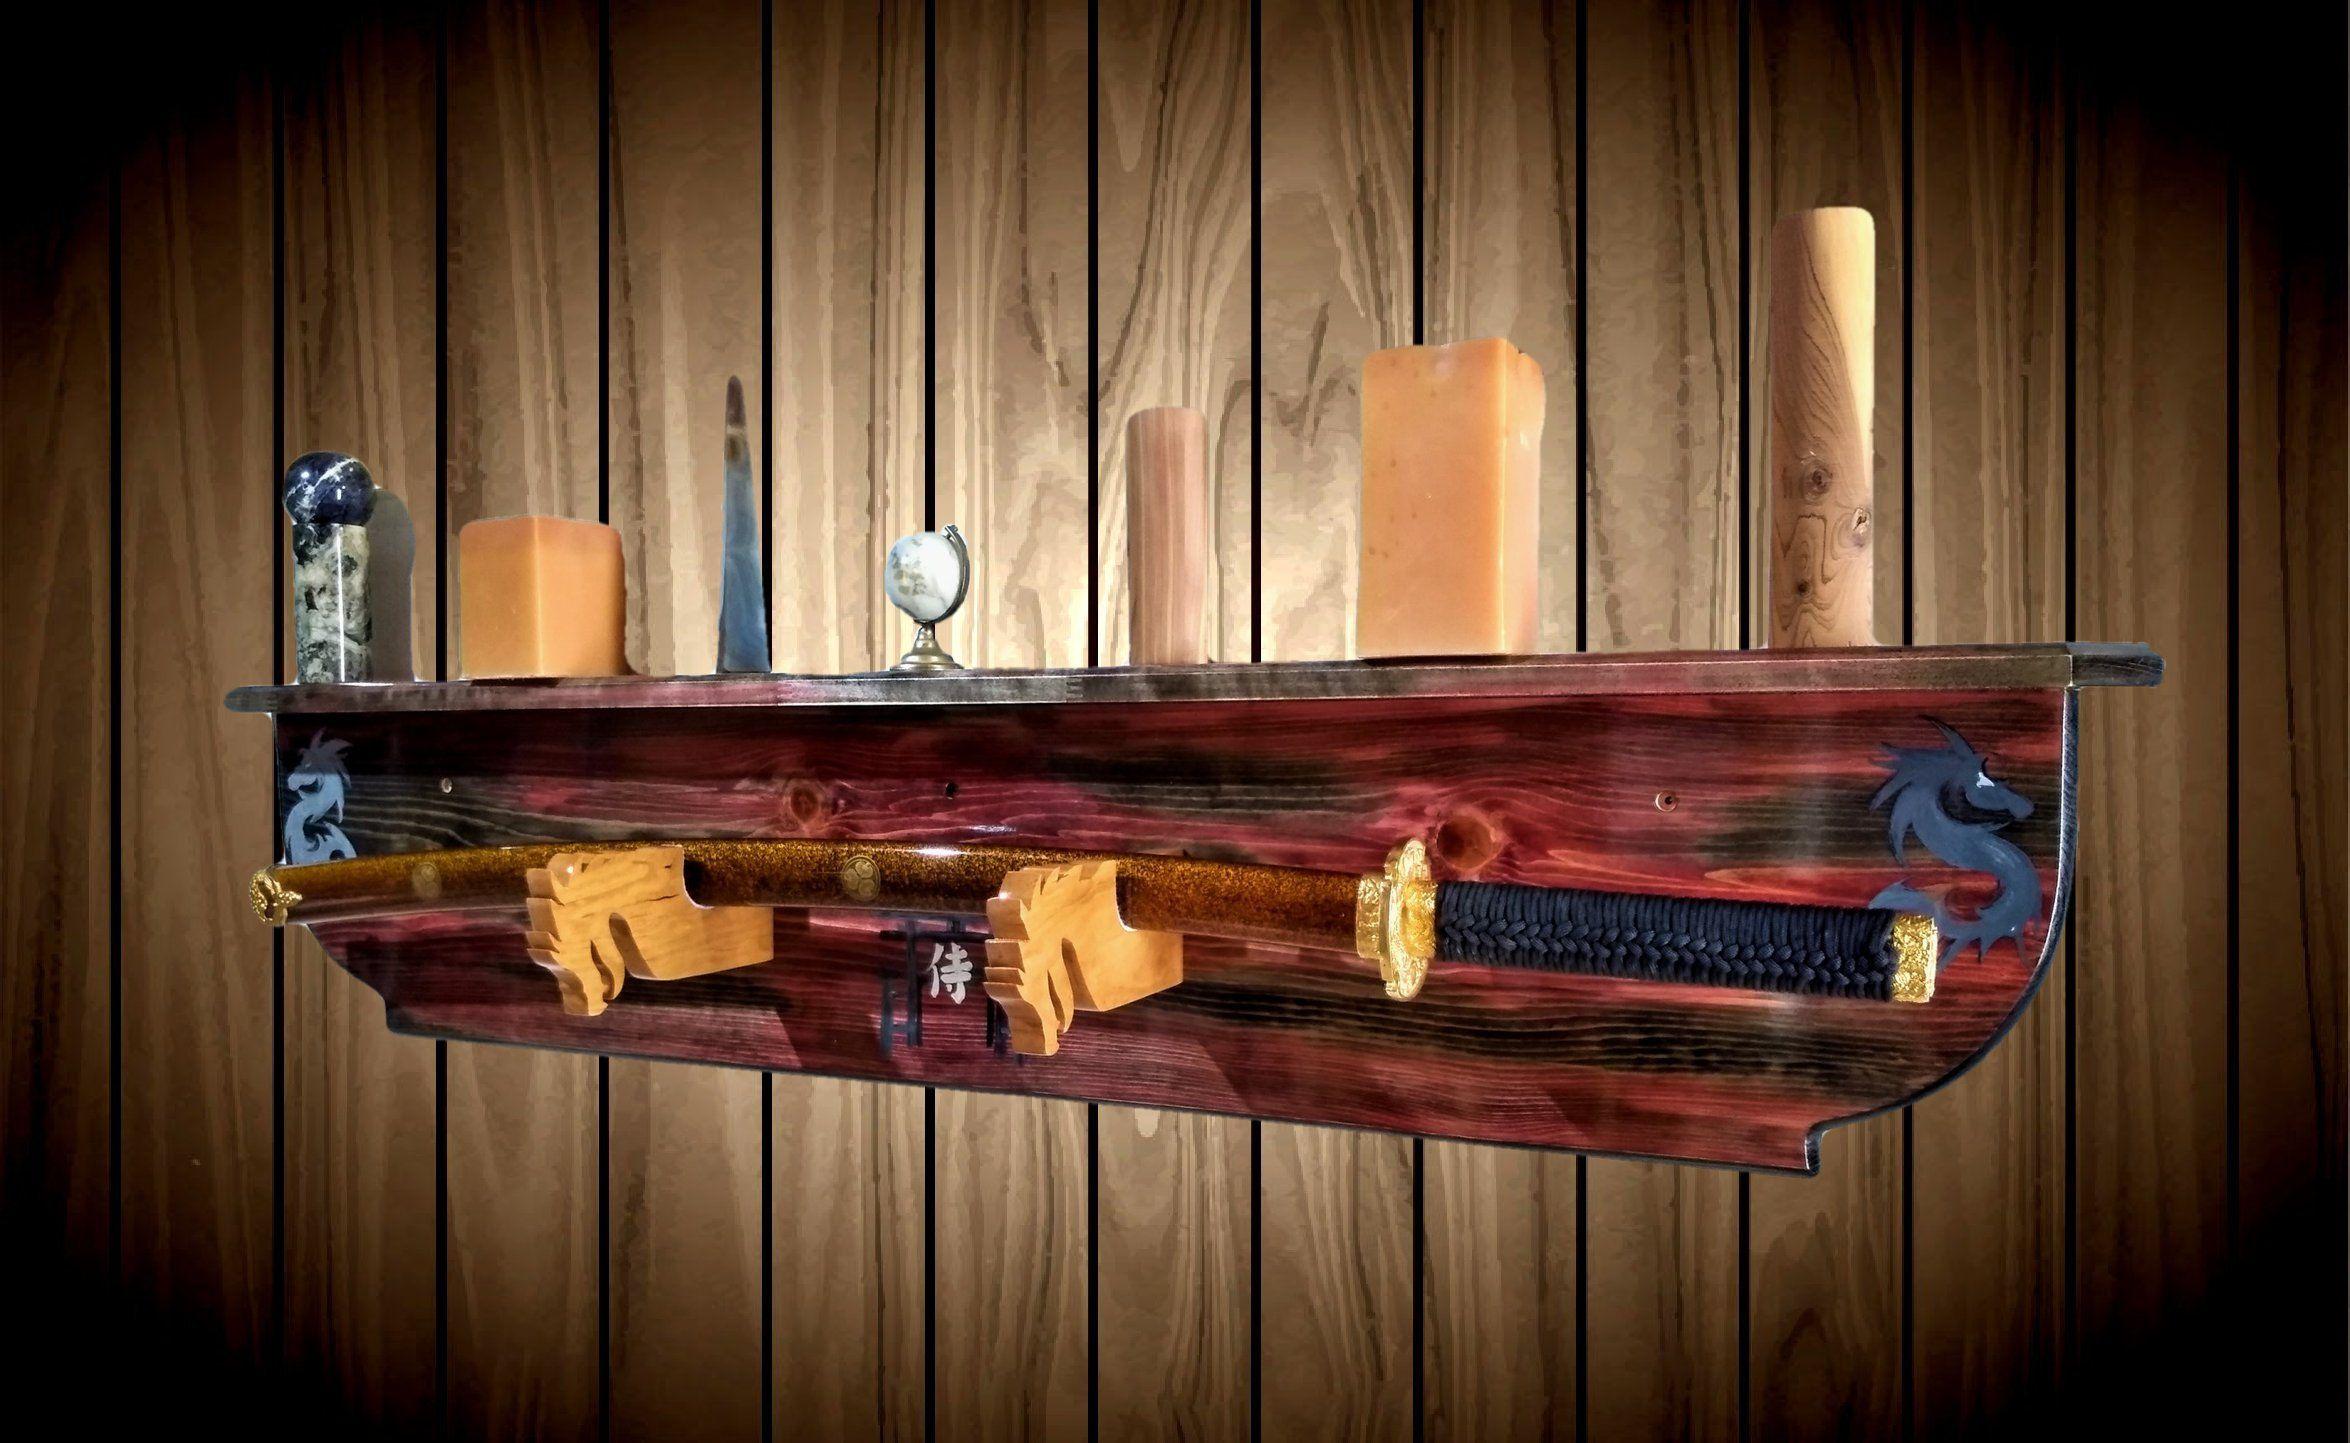 Bokken Katana Samurai Sword Display Rack Wall Mount Cherry